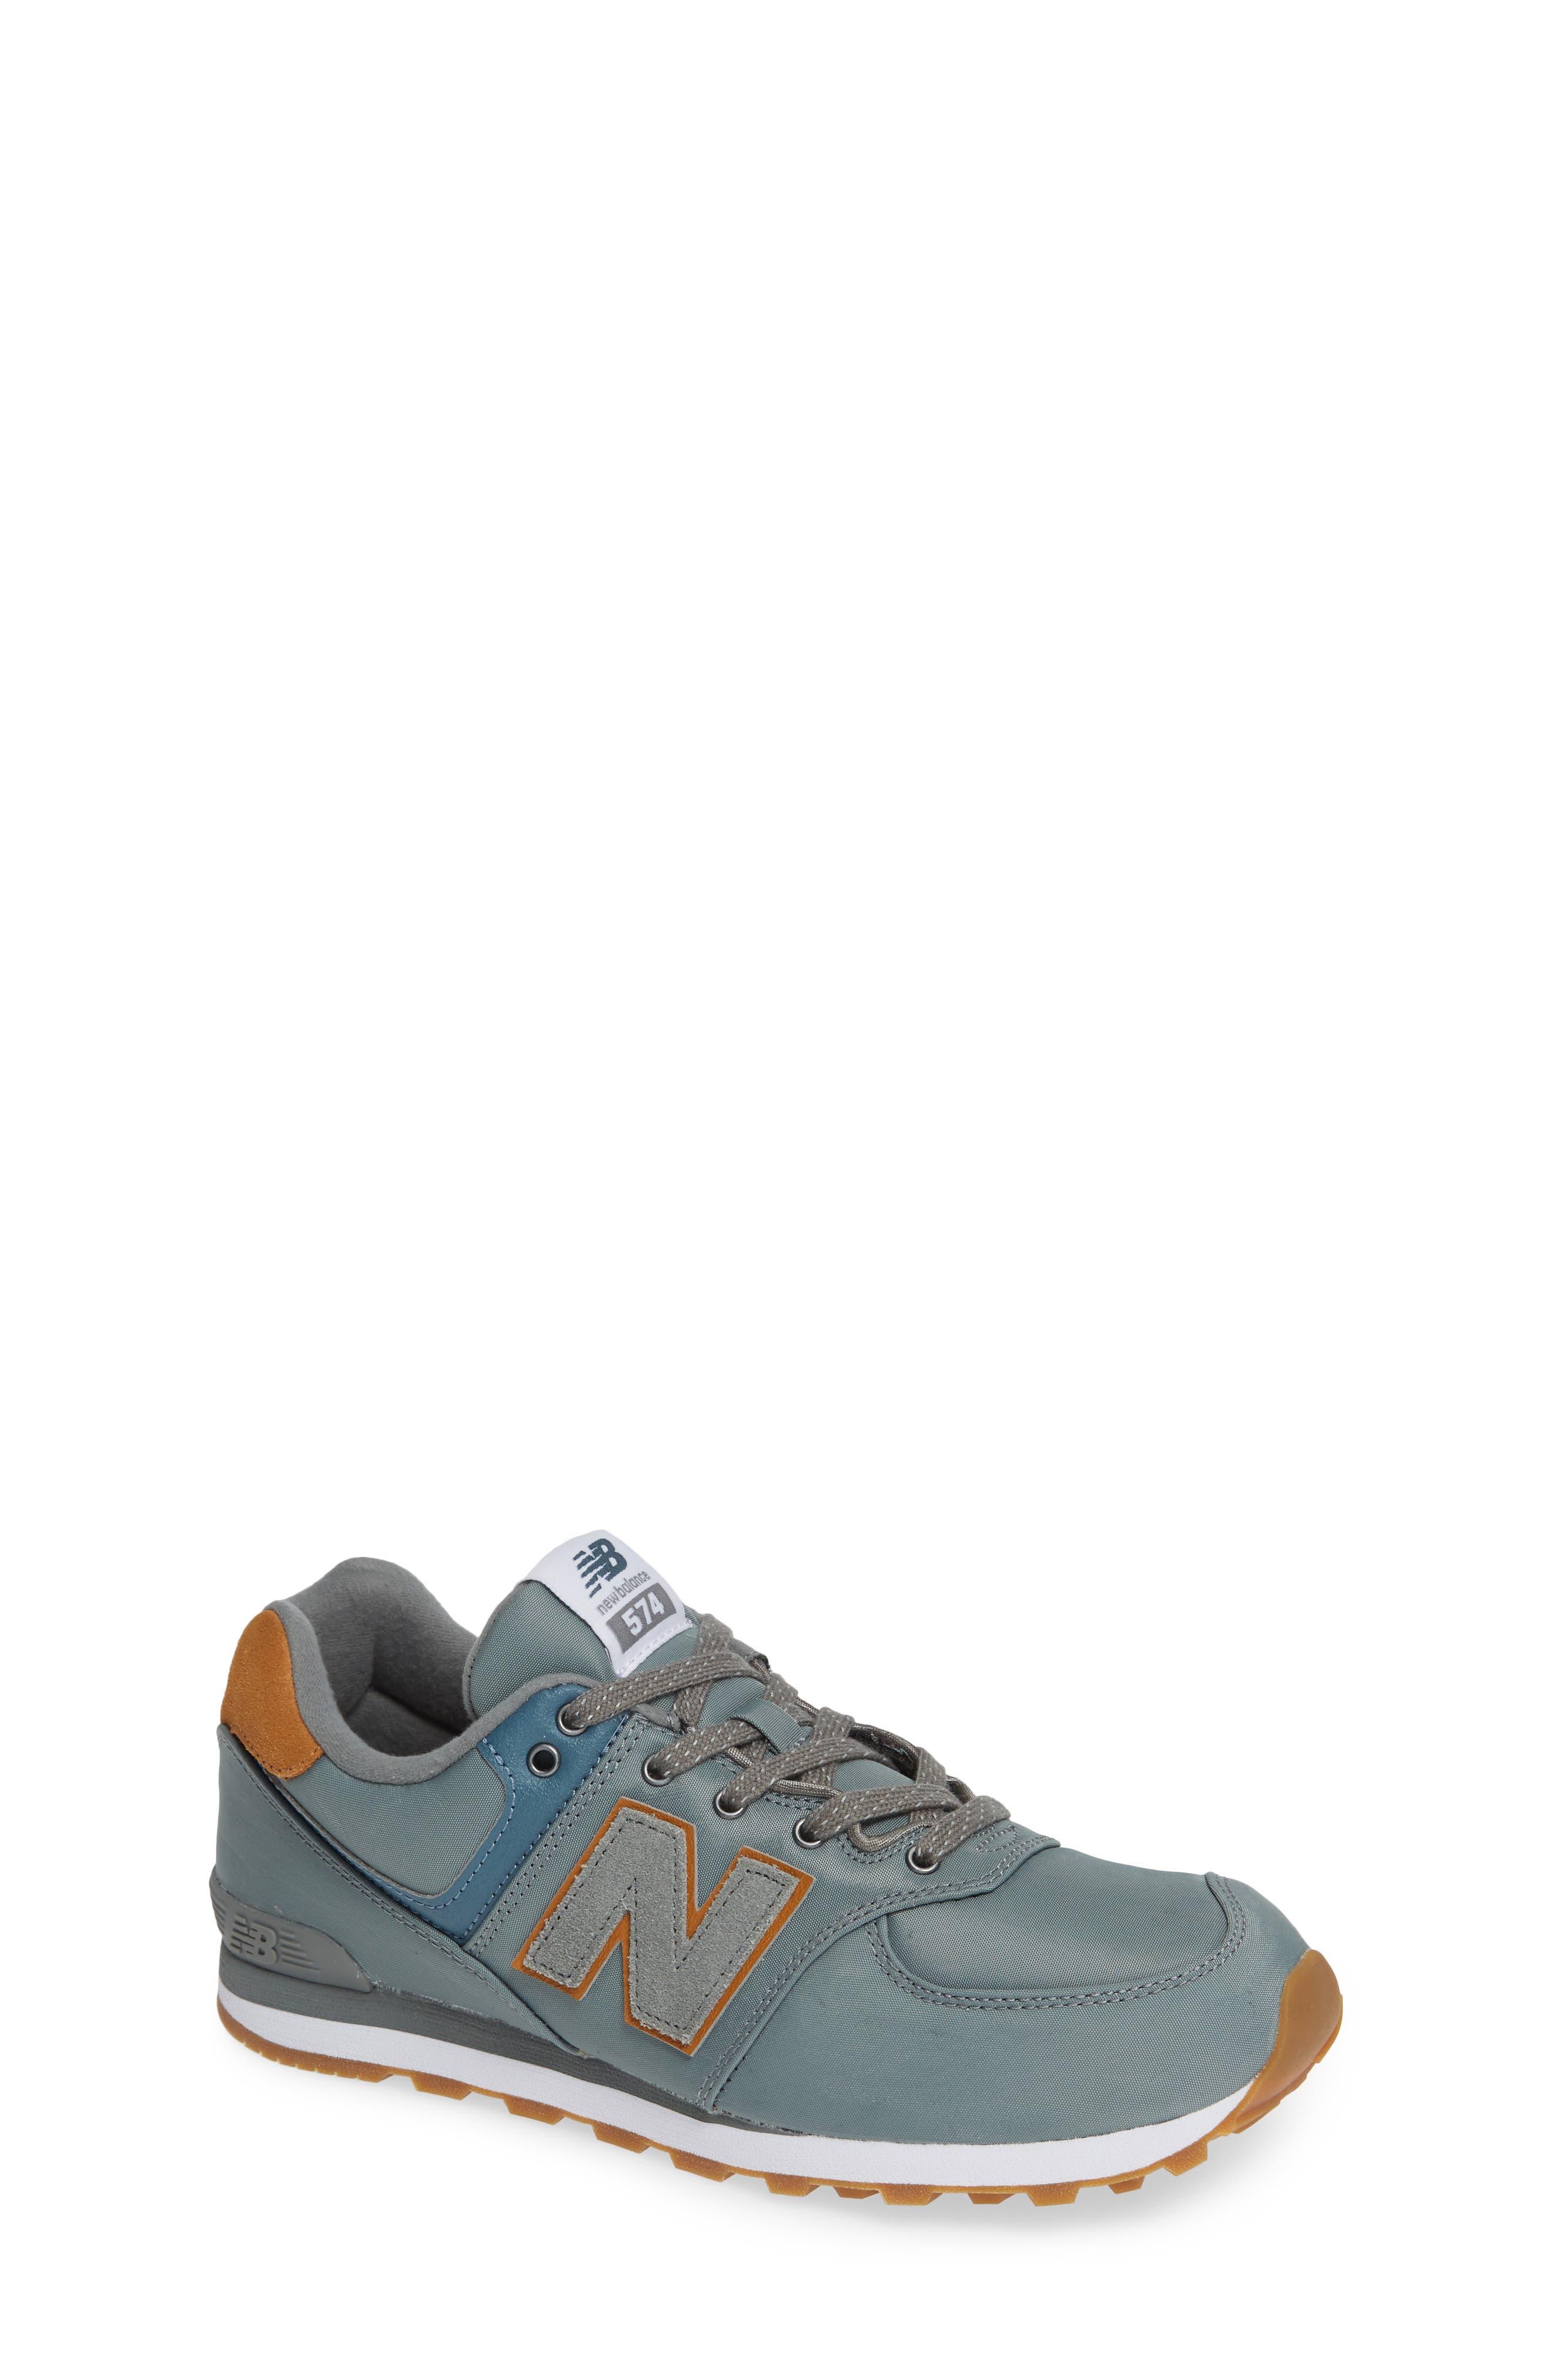 574 Essentials Sneaker,                             Main thumbnail 1, color,                             Sedona Sage